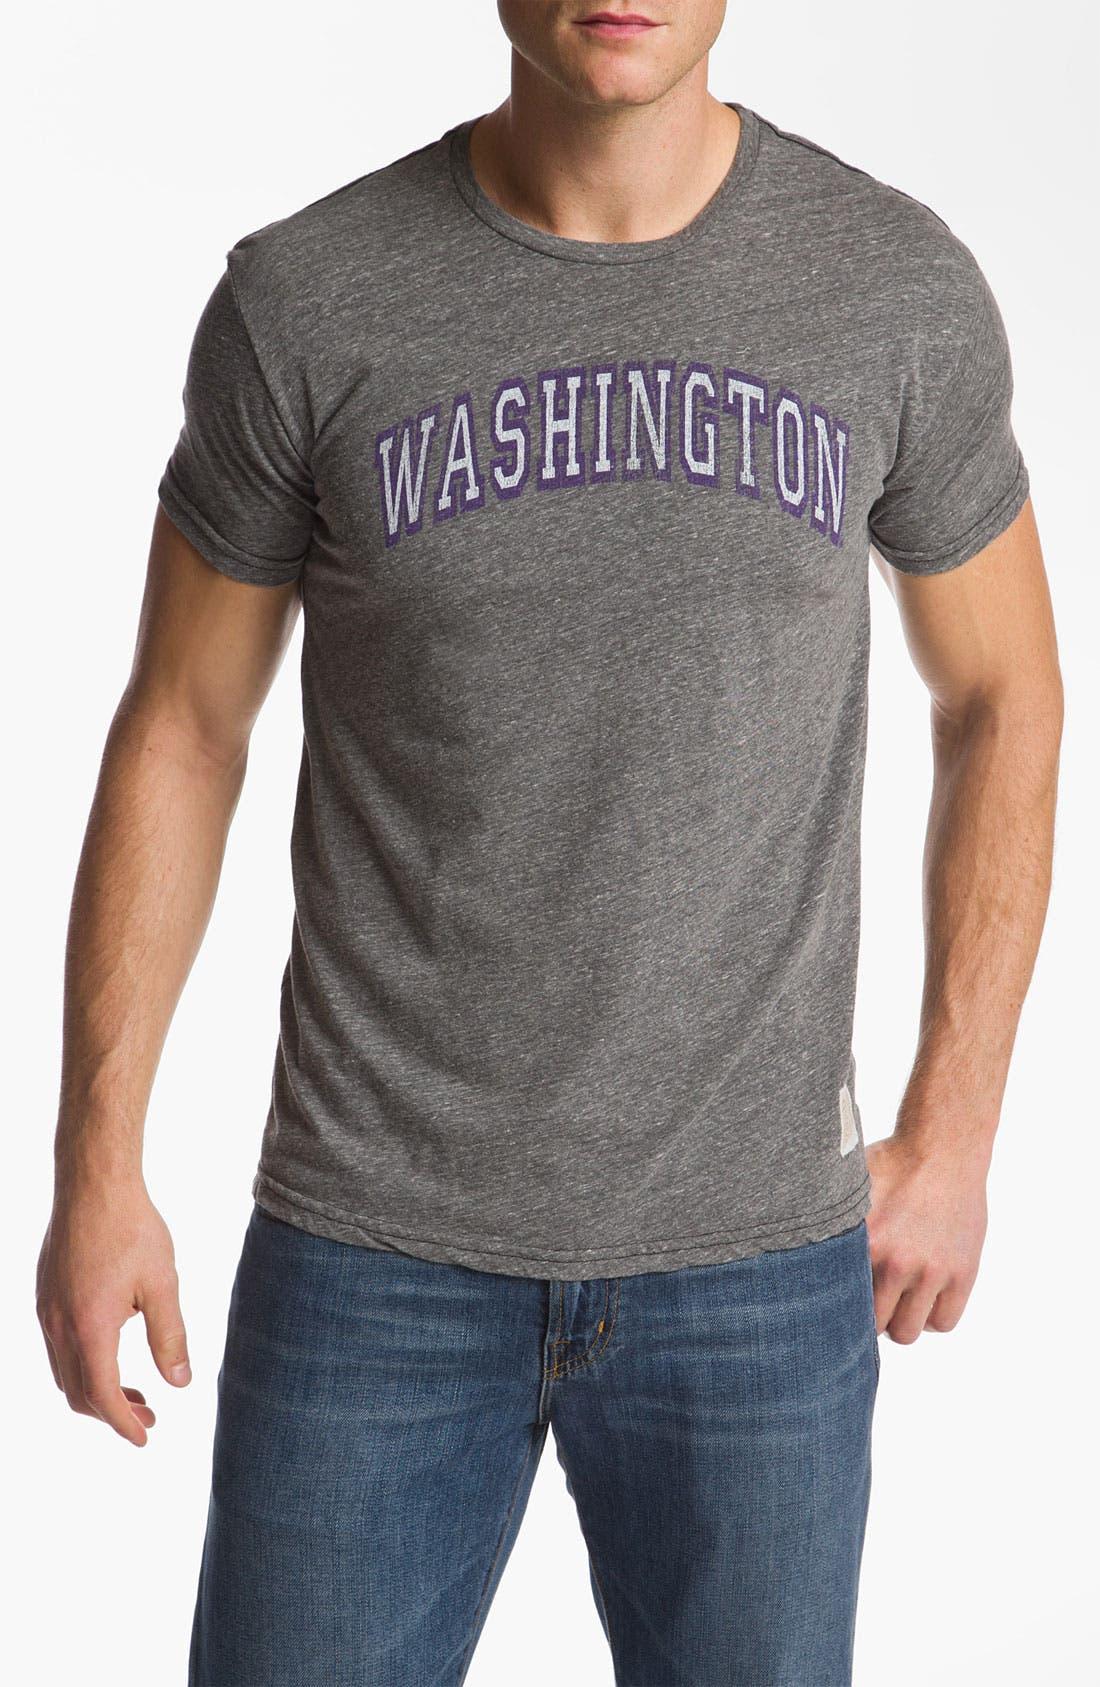 Main Image - The Original Retro Brand 'University of Washington Huskies' T-Shirt